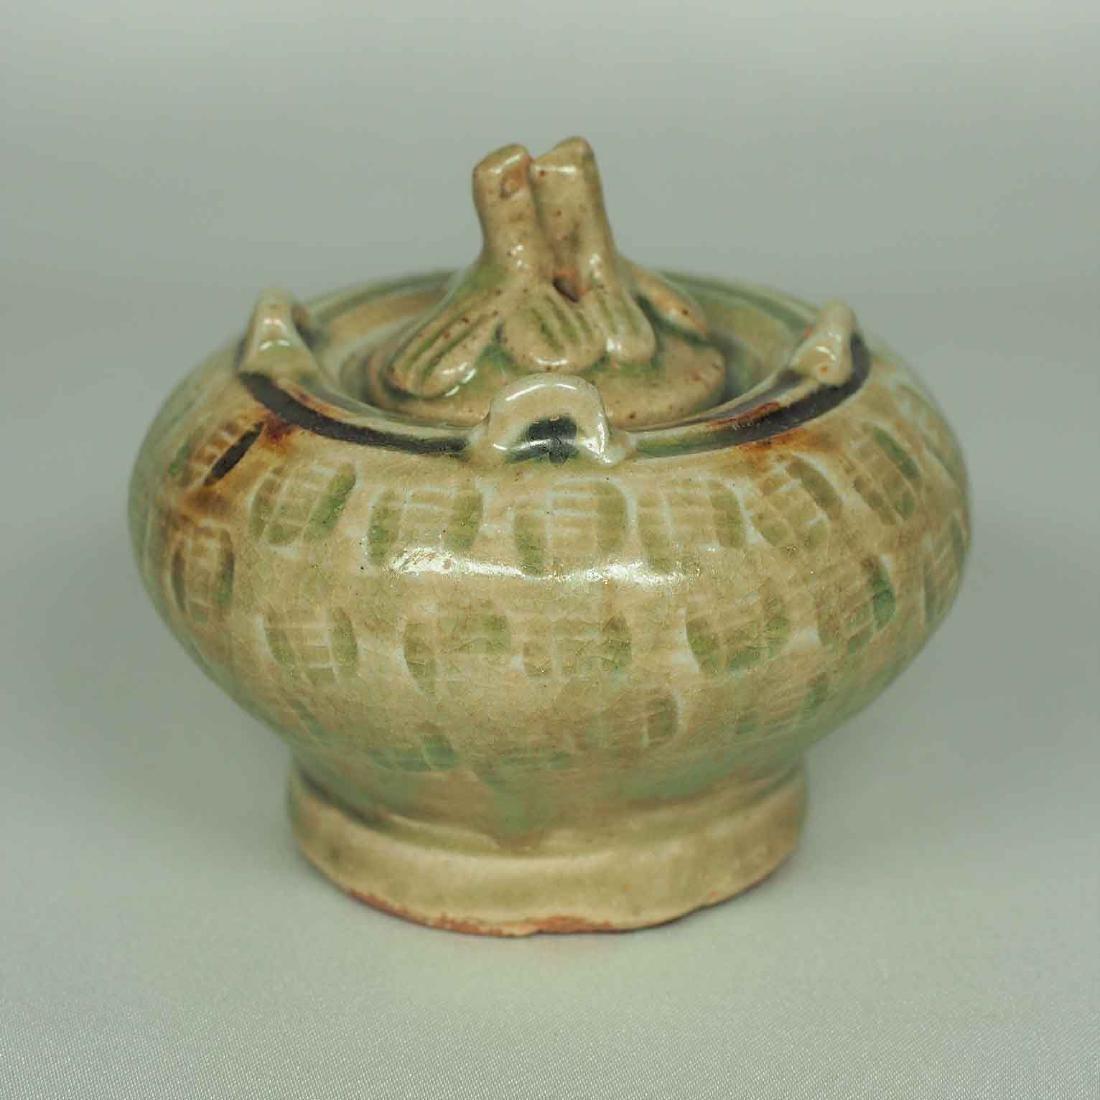 Lidded Water Pot with Brown Spot, Eastern Jin Dynasty - 3